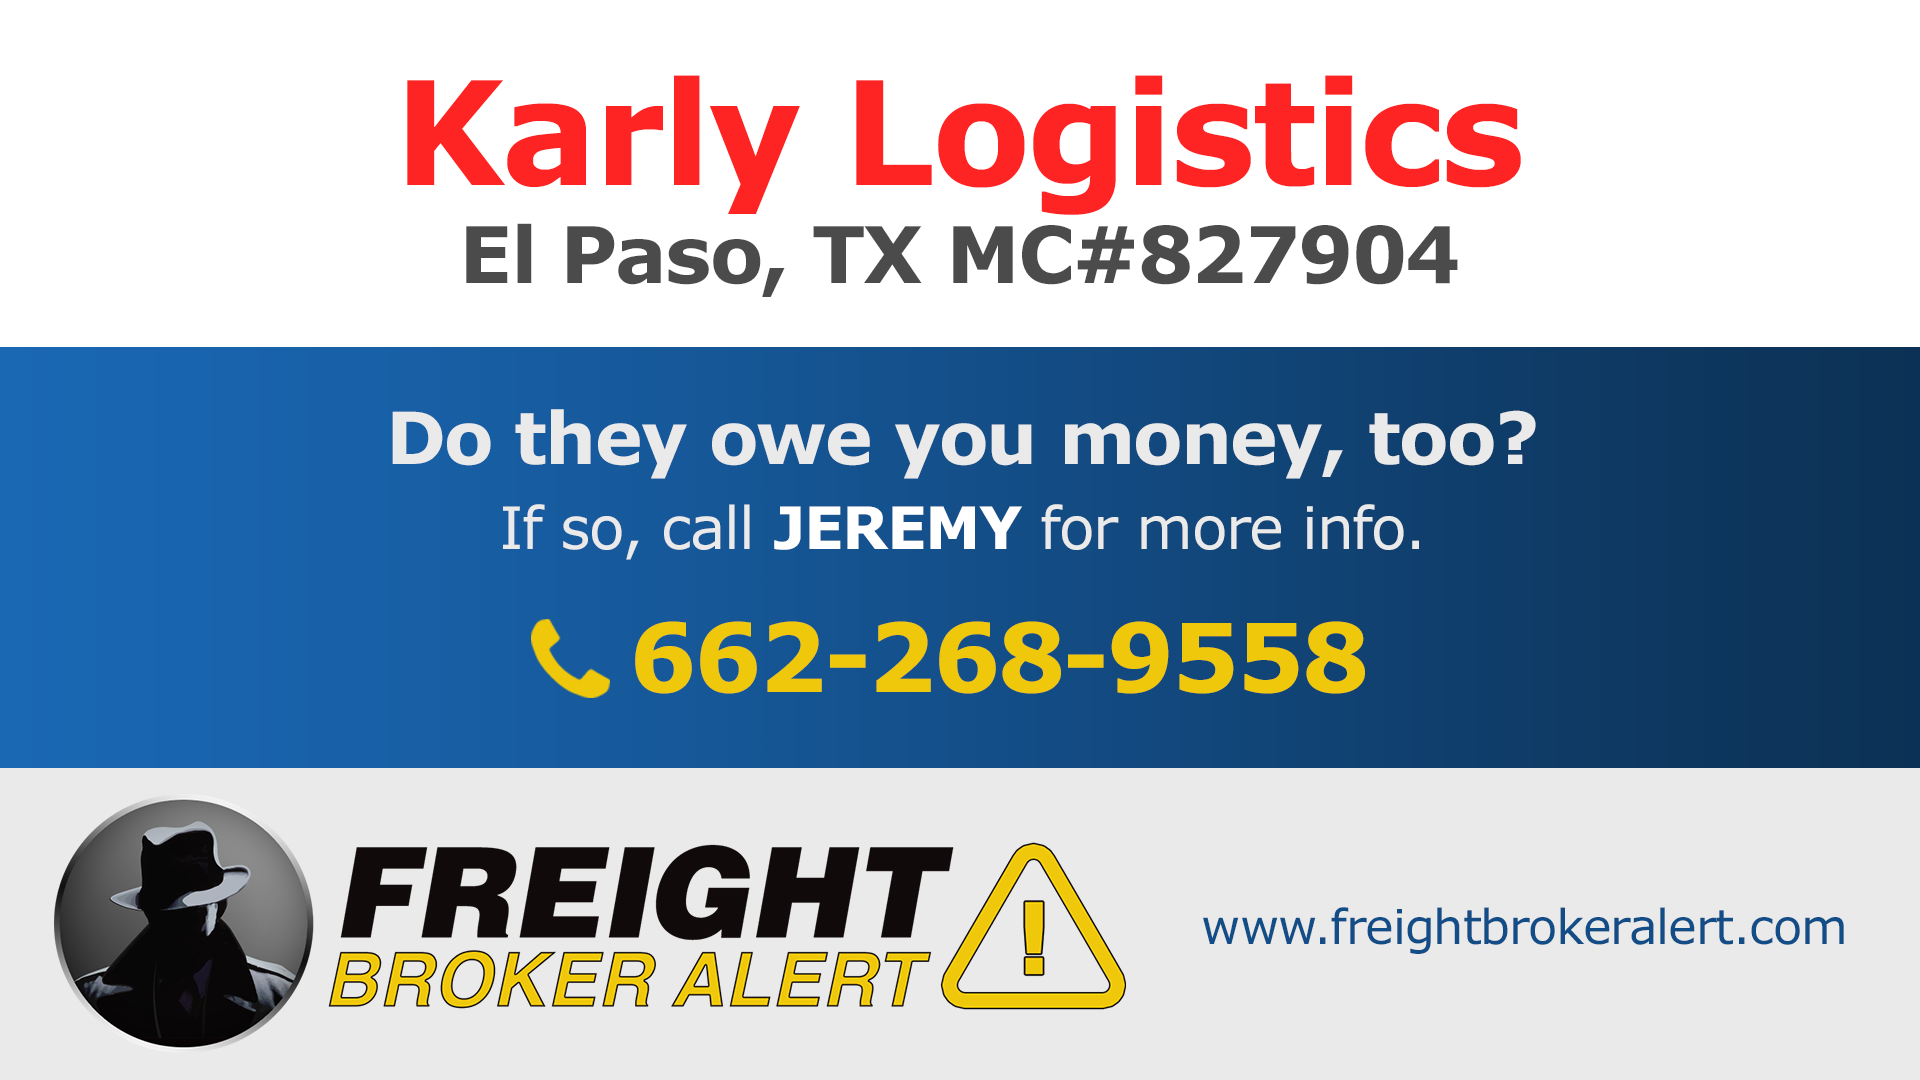 Karly Logistics Texas